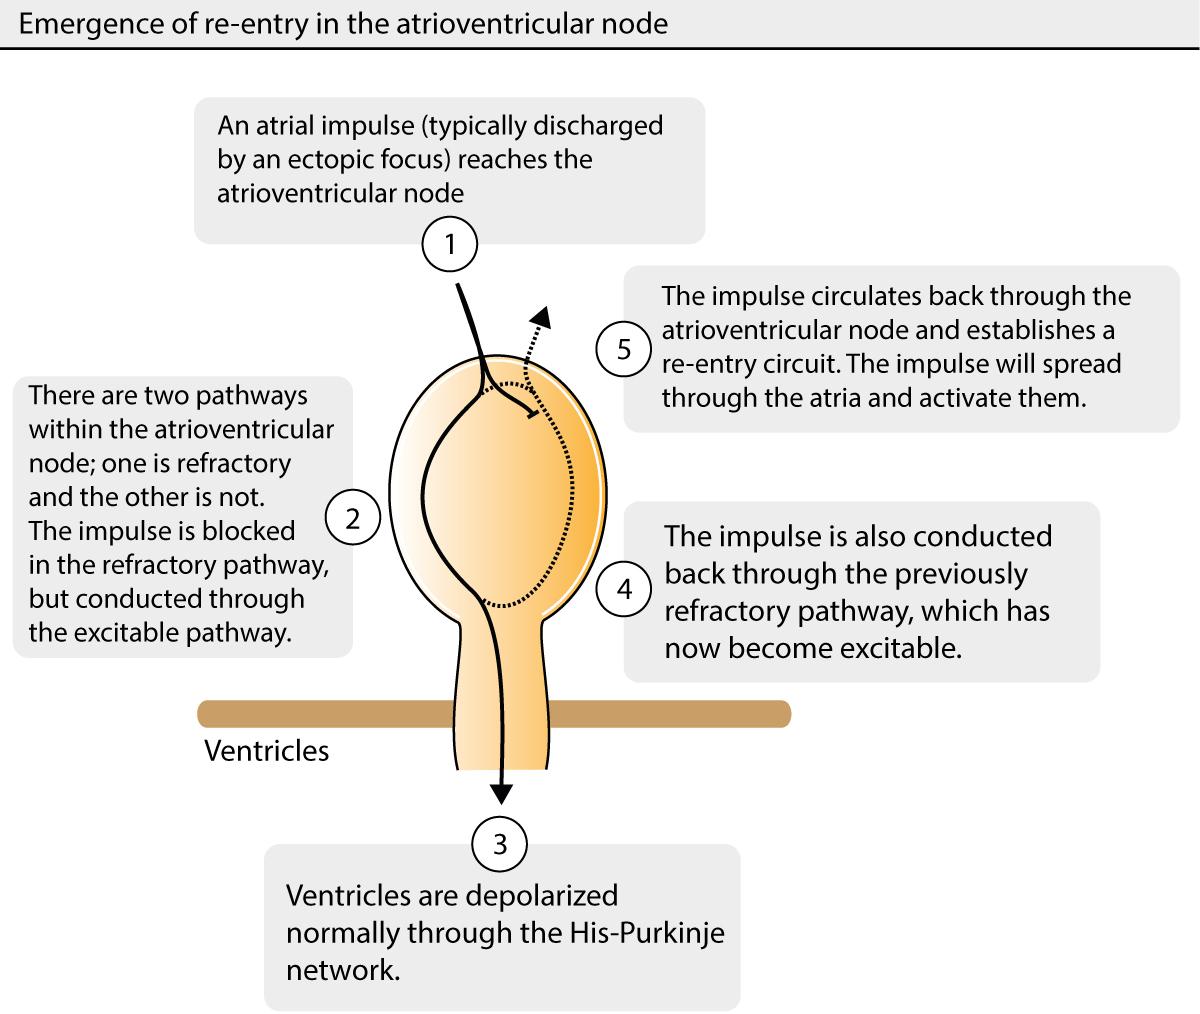 Figure 1. Mechanism leading to atrioventricular nodal reentrant tachycardia (AVNRT).